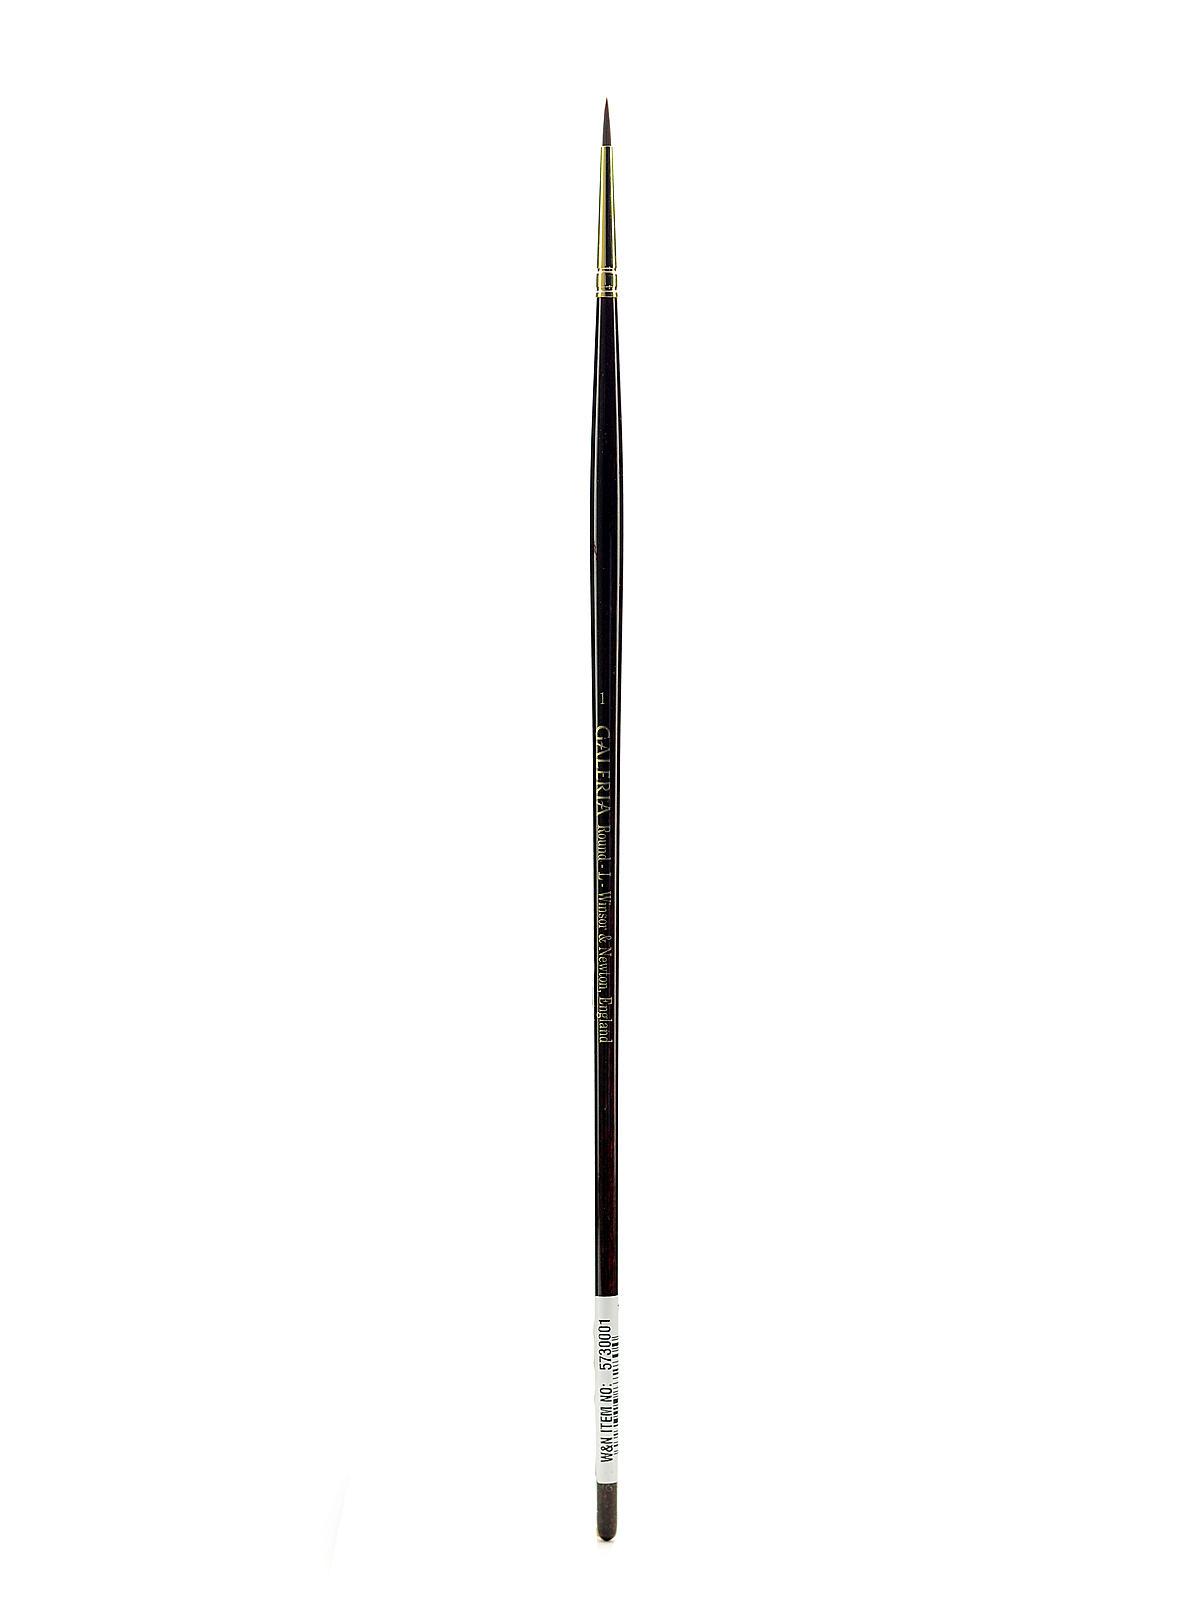 White apron galleria 7 - Galeria Long Handled Brushes 1 Round